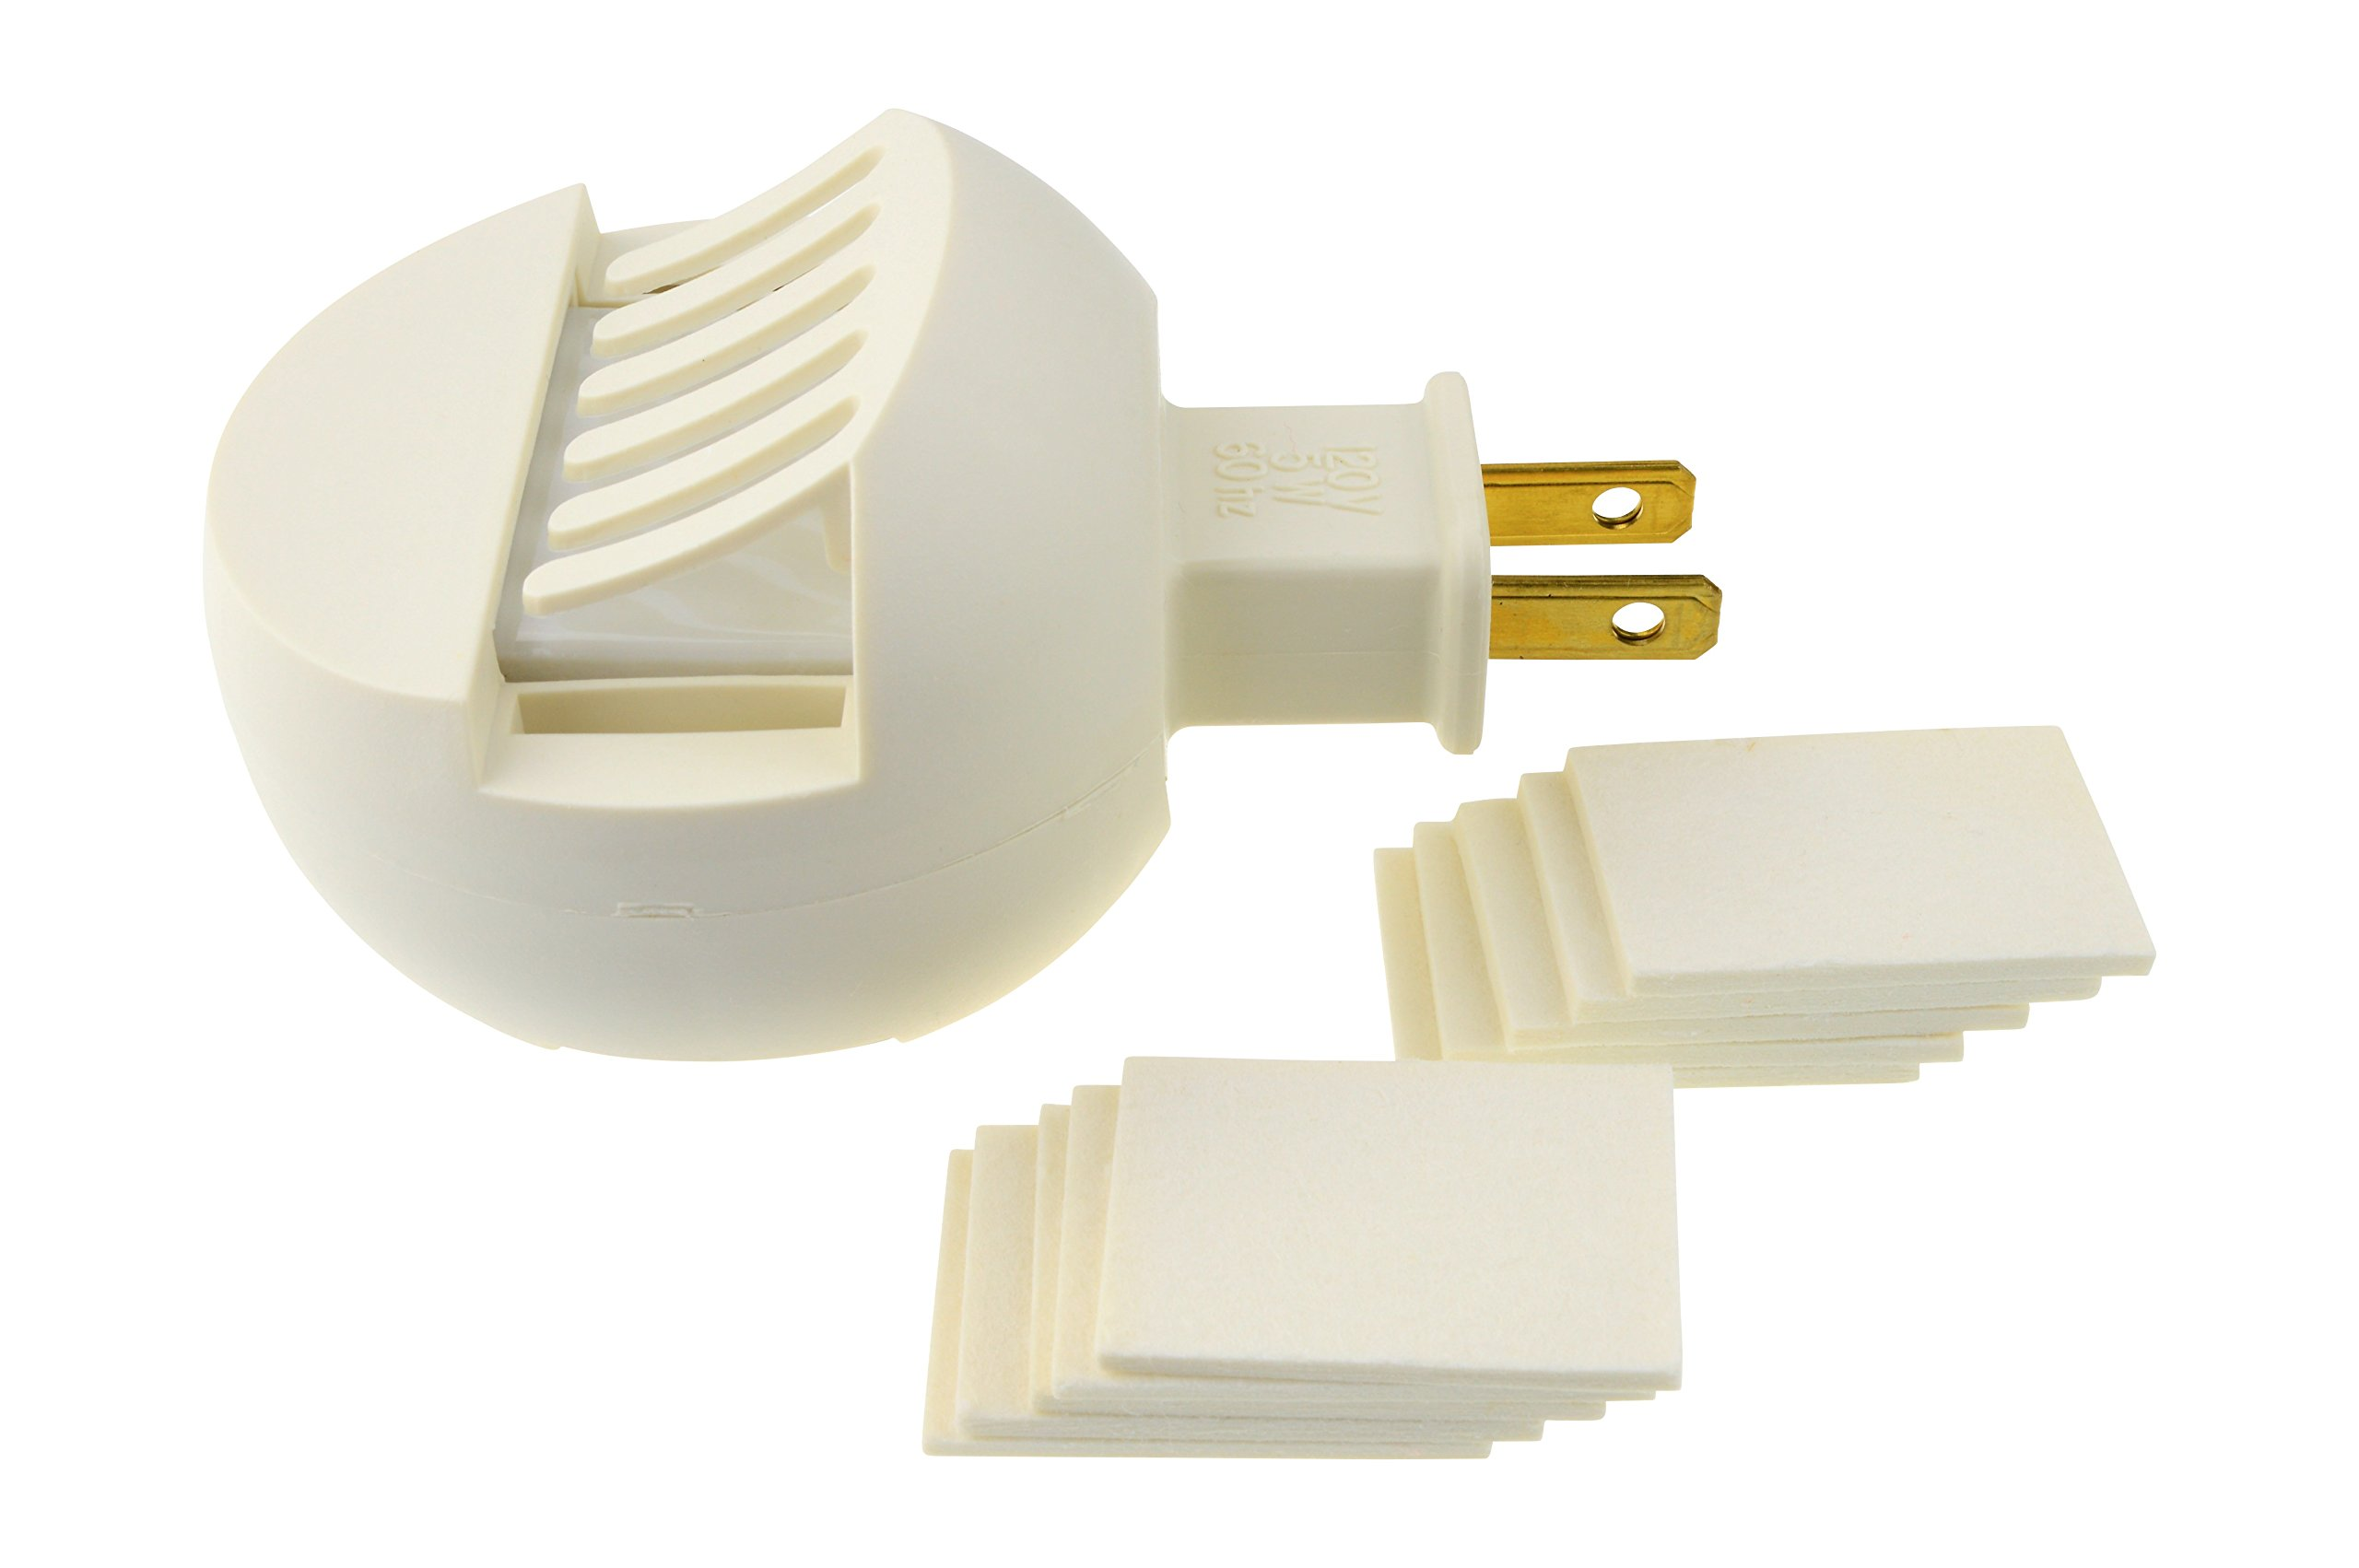 Scentball Plug in Electric Diffuser